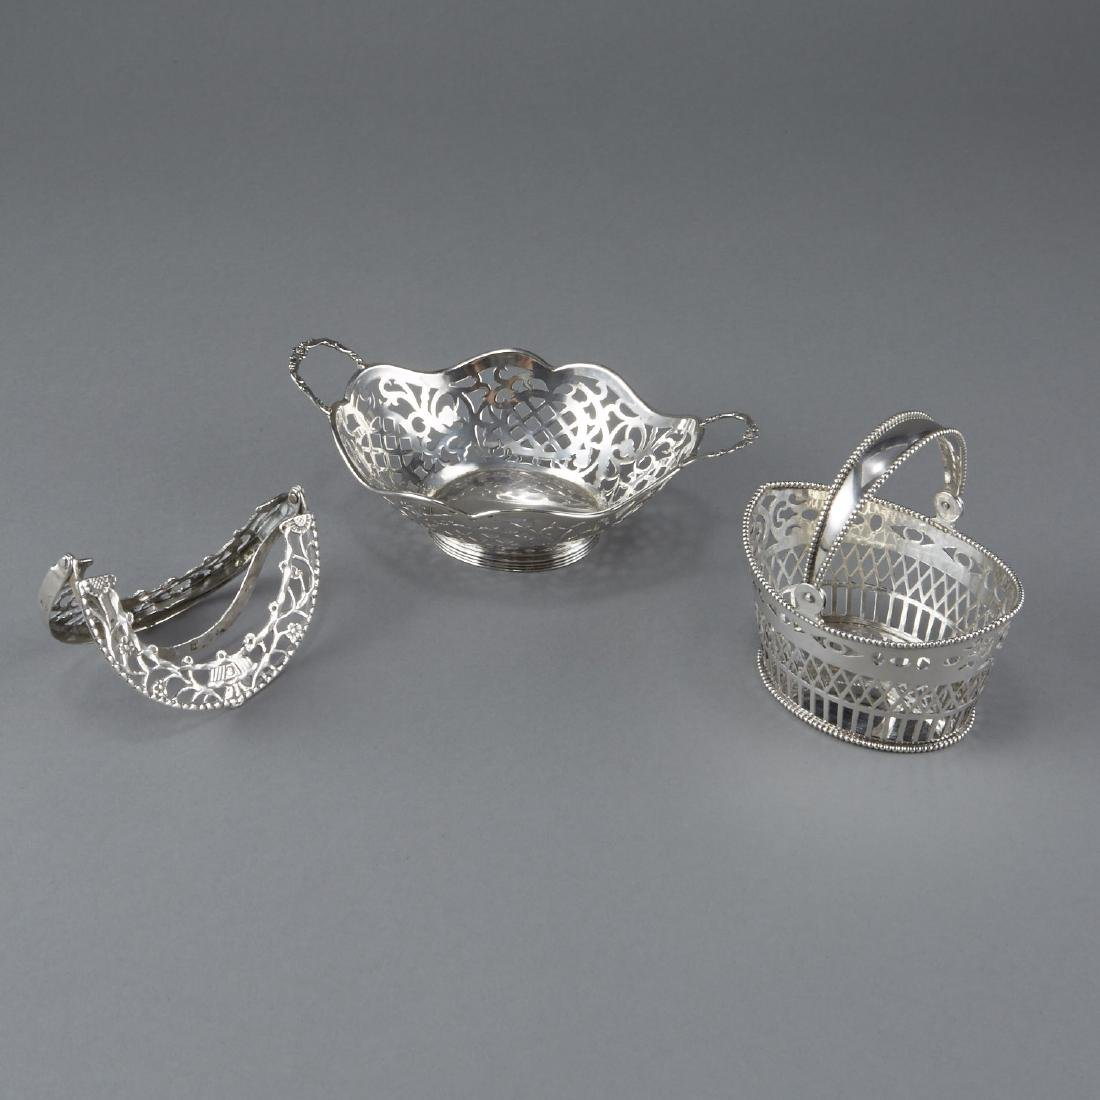 Set of 3 Sterling Silver Baskets